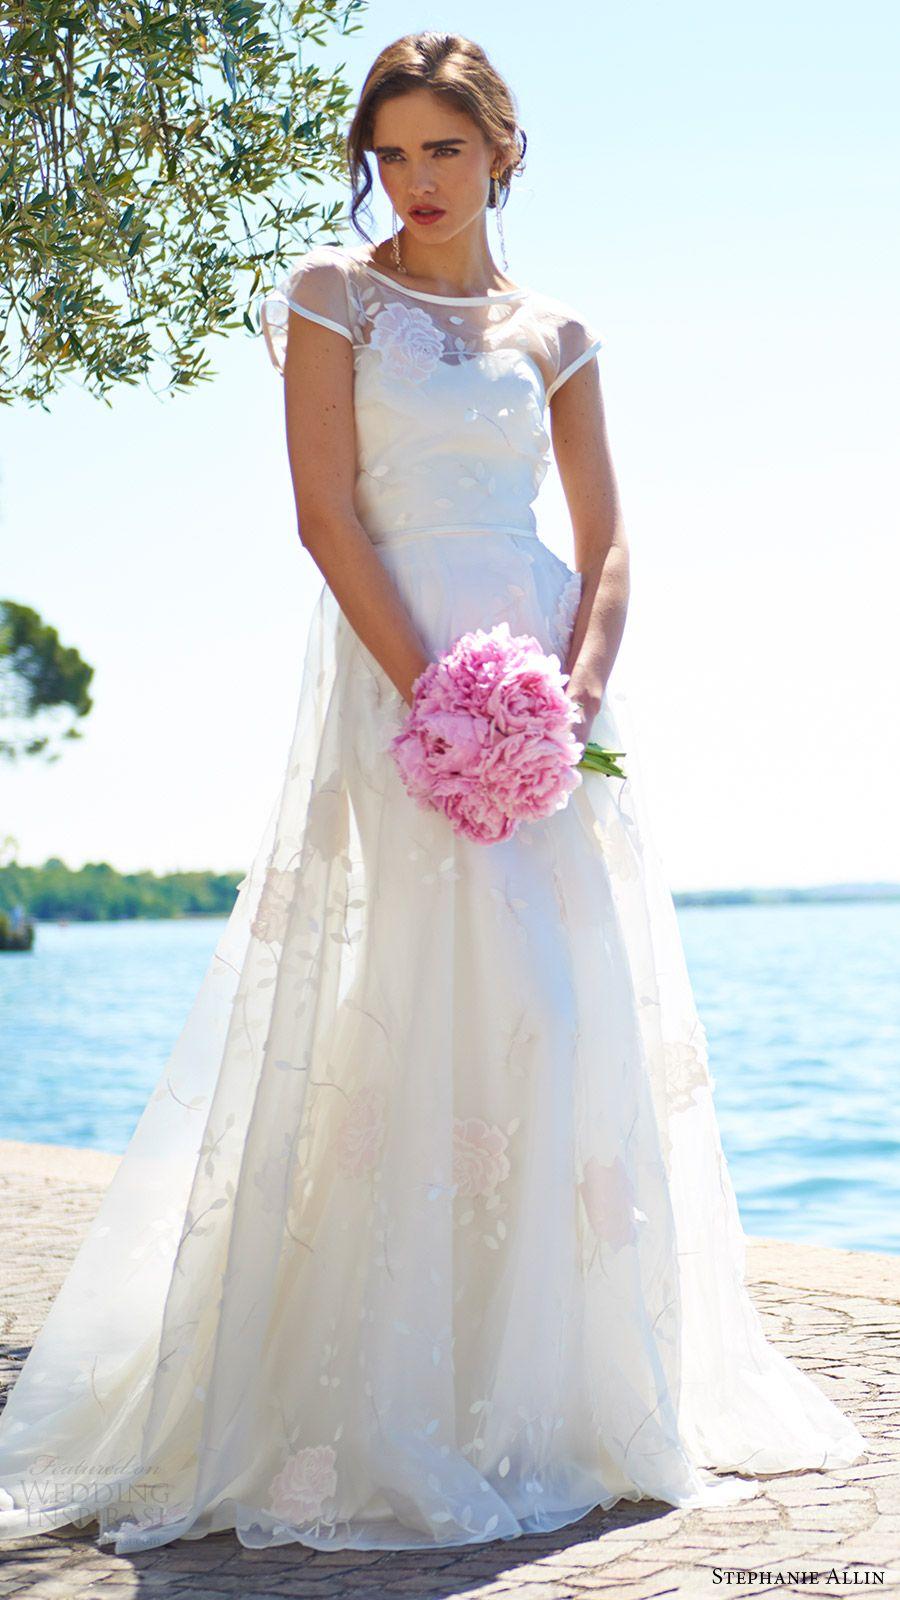 Jcrew wedding dress  Stephanie Allin  Wedding Dresses Bellissimo Bridal Collection